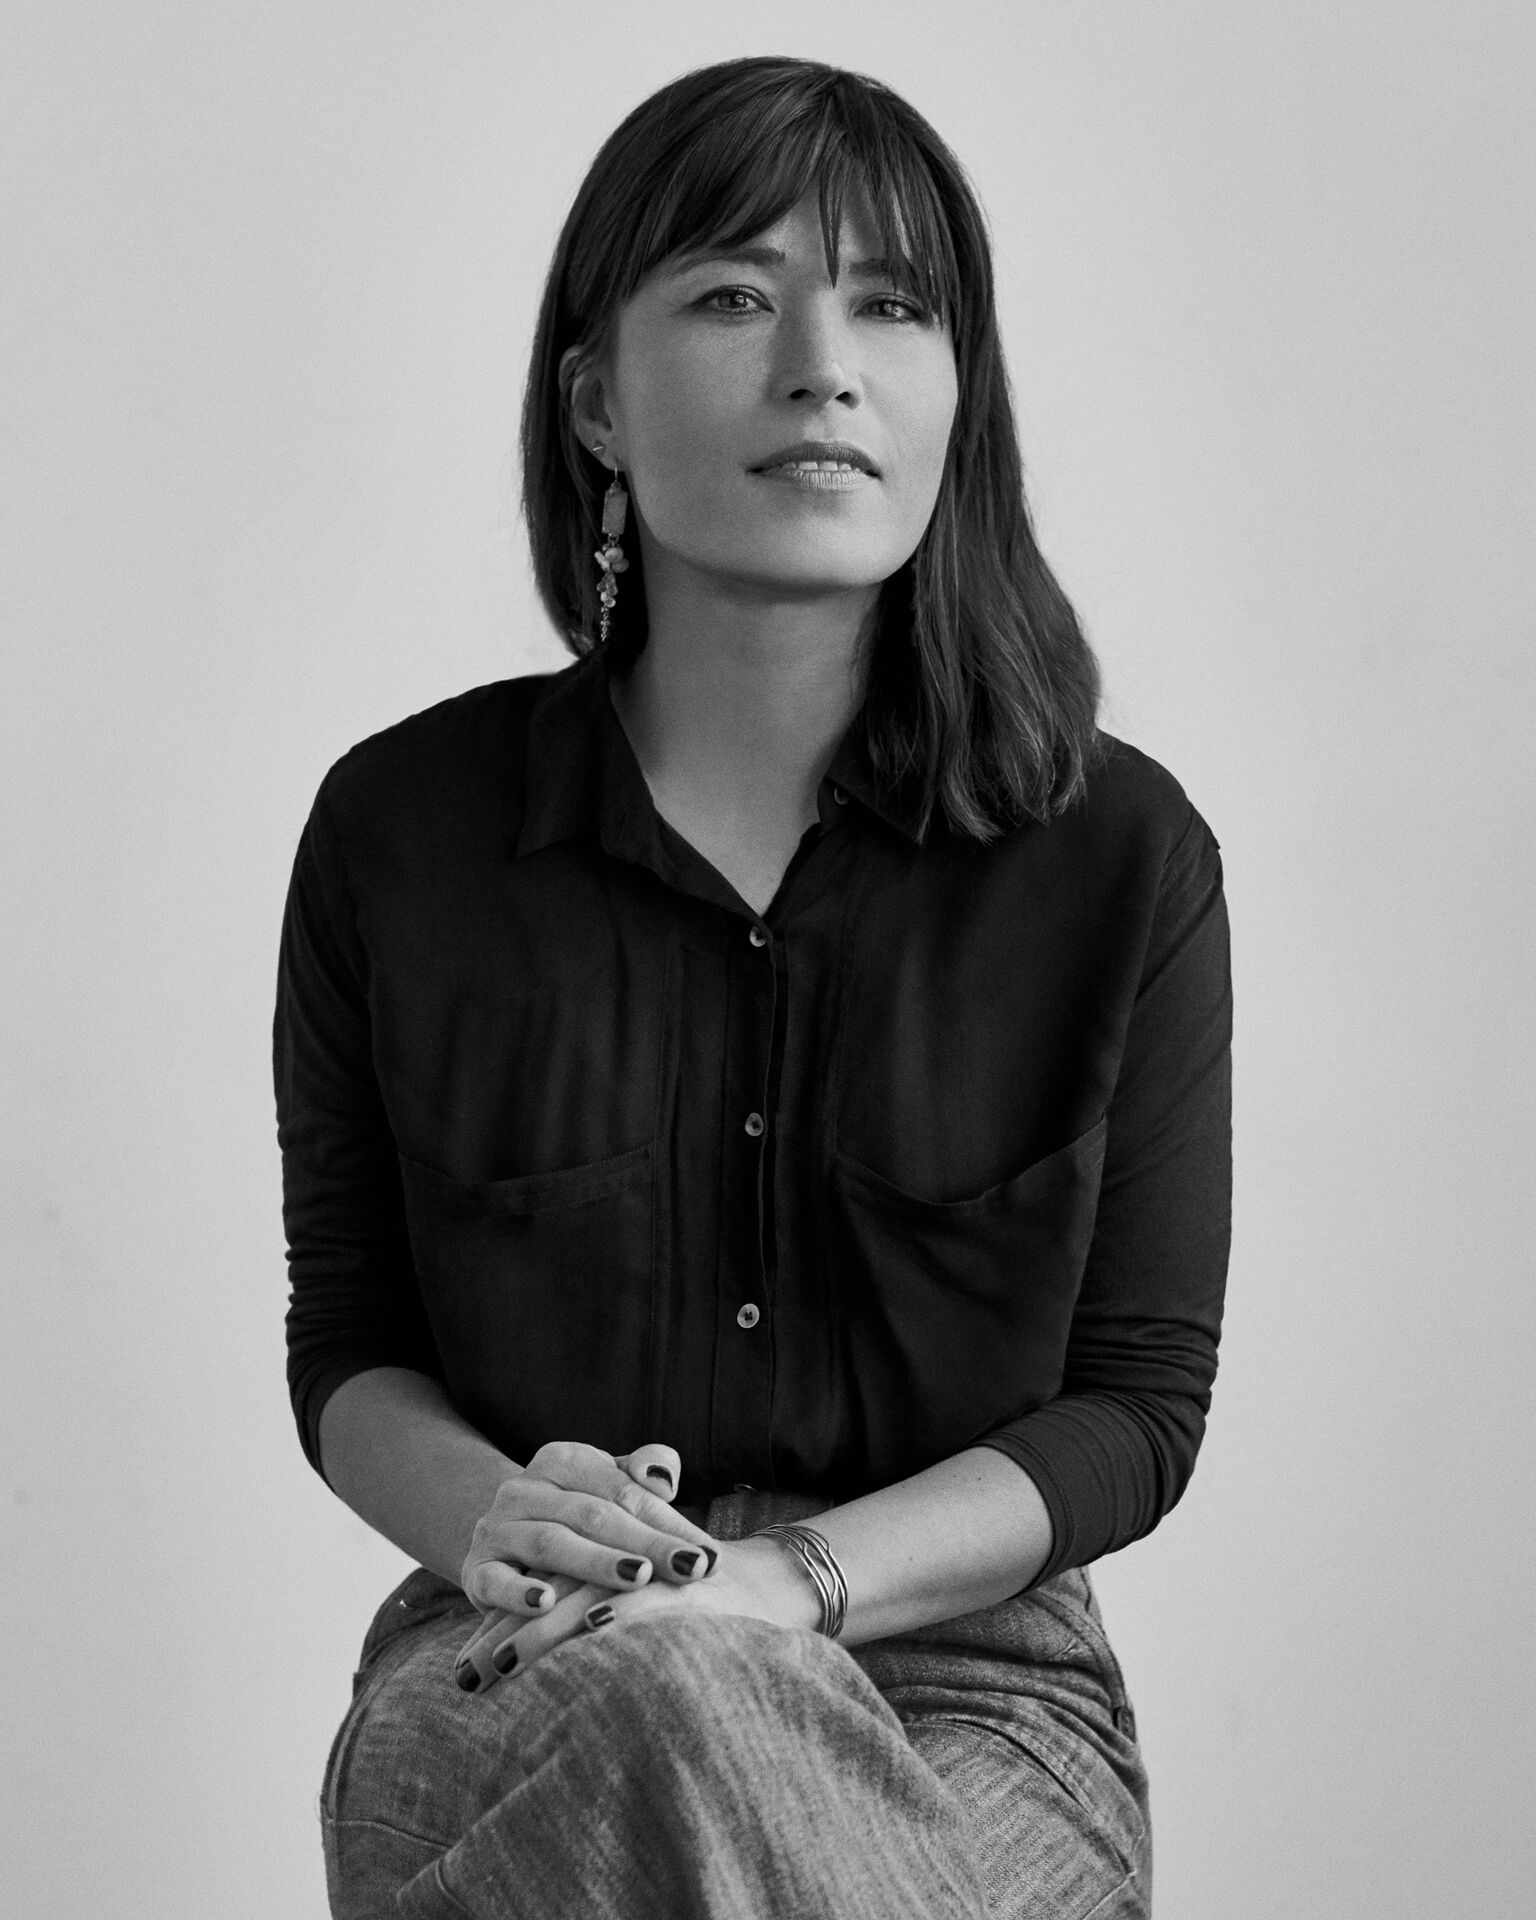 portrait by Ed Singleton